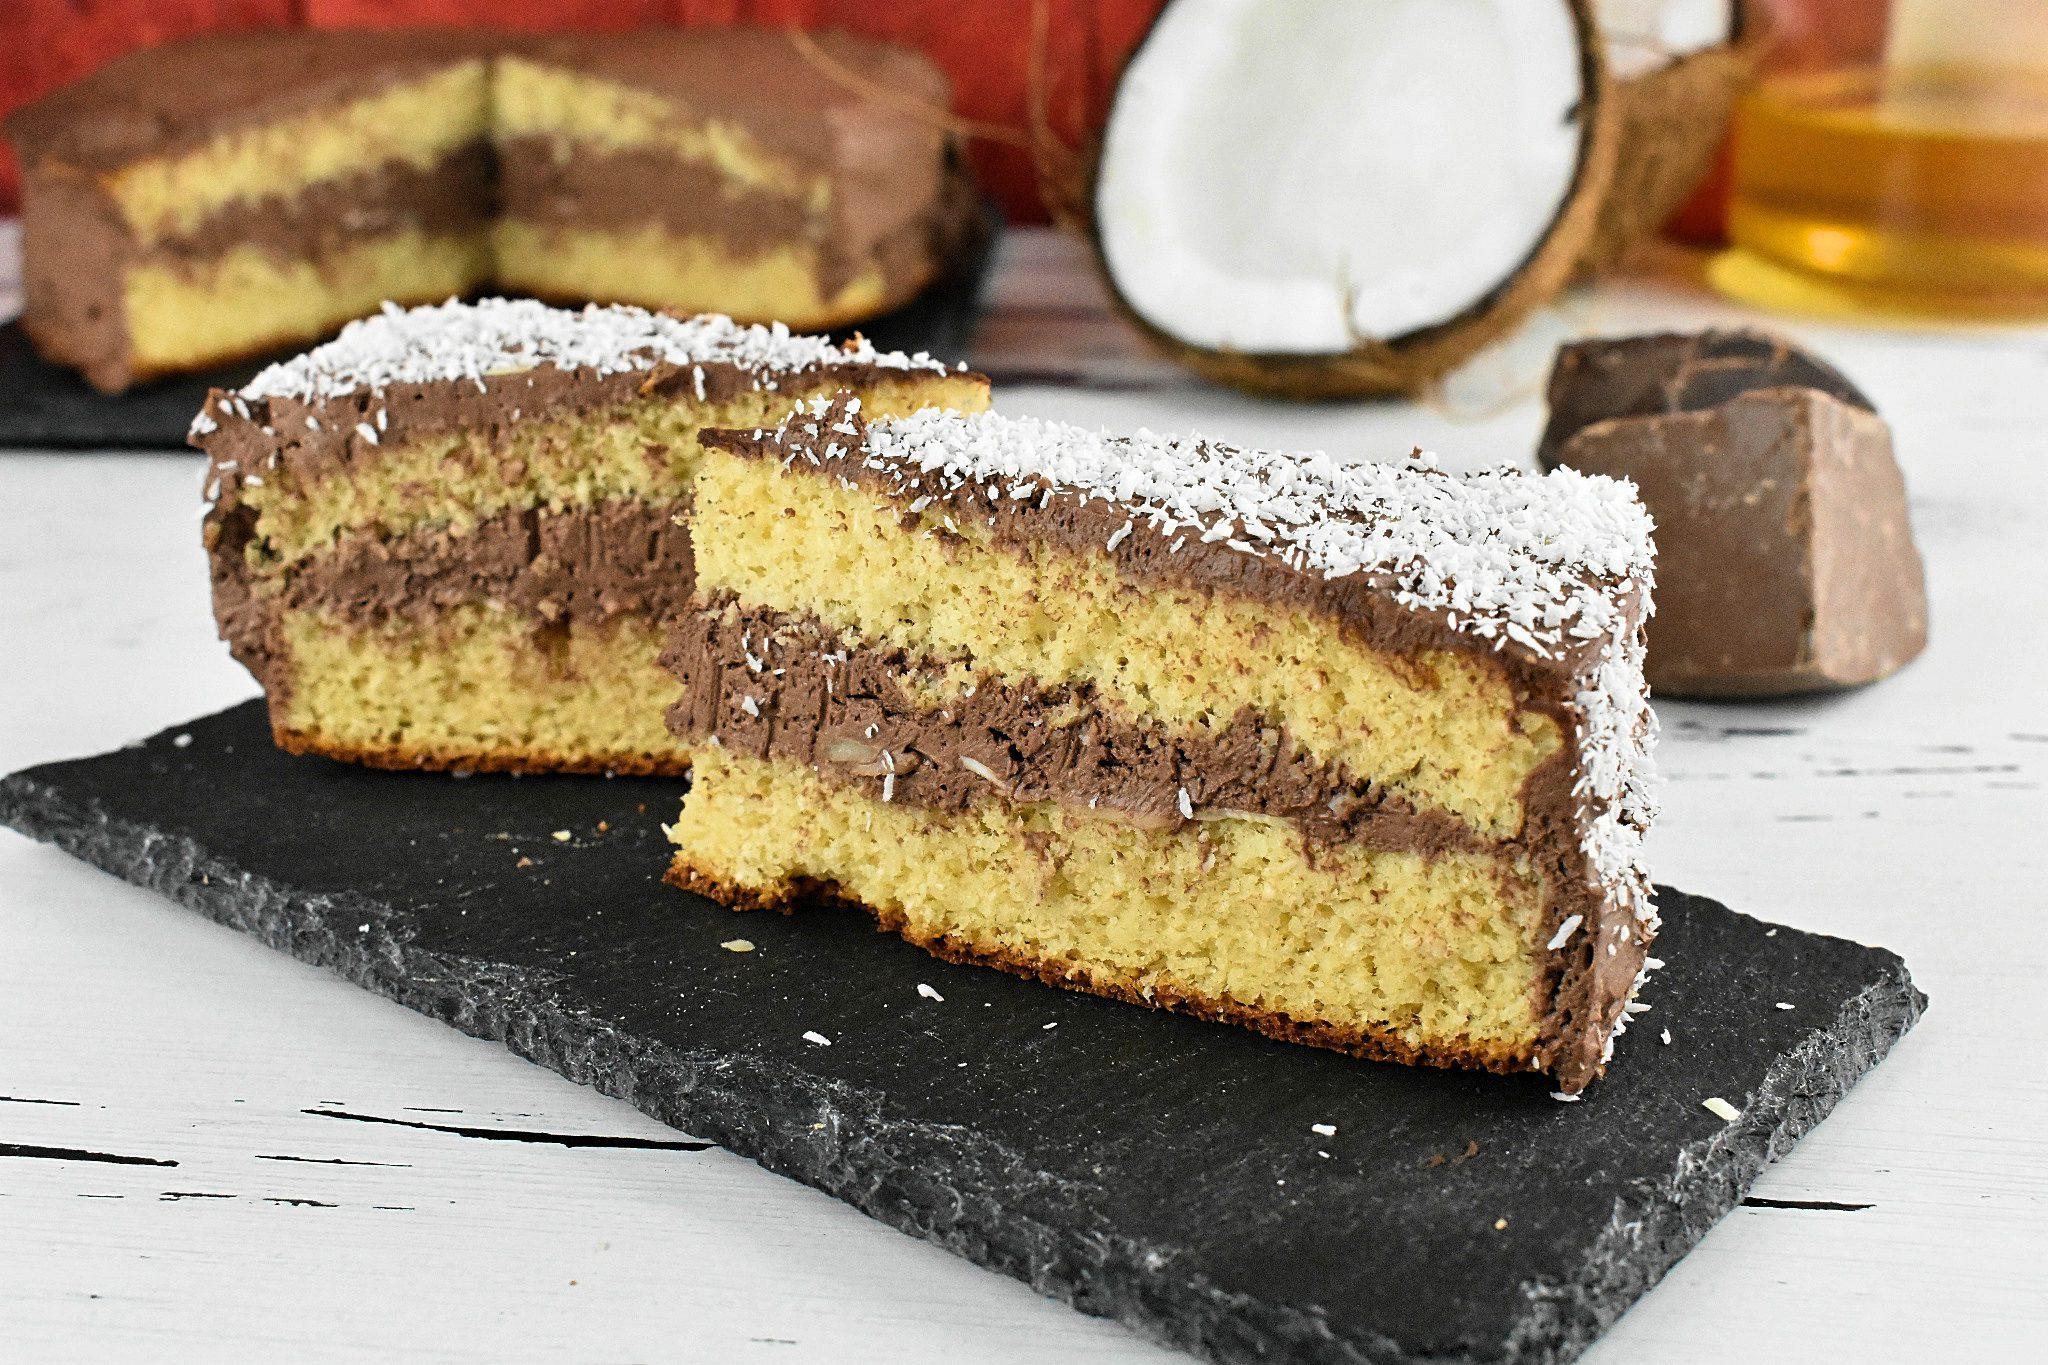 Gluten-free-almond-cake-2-SunCakeMom